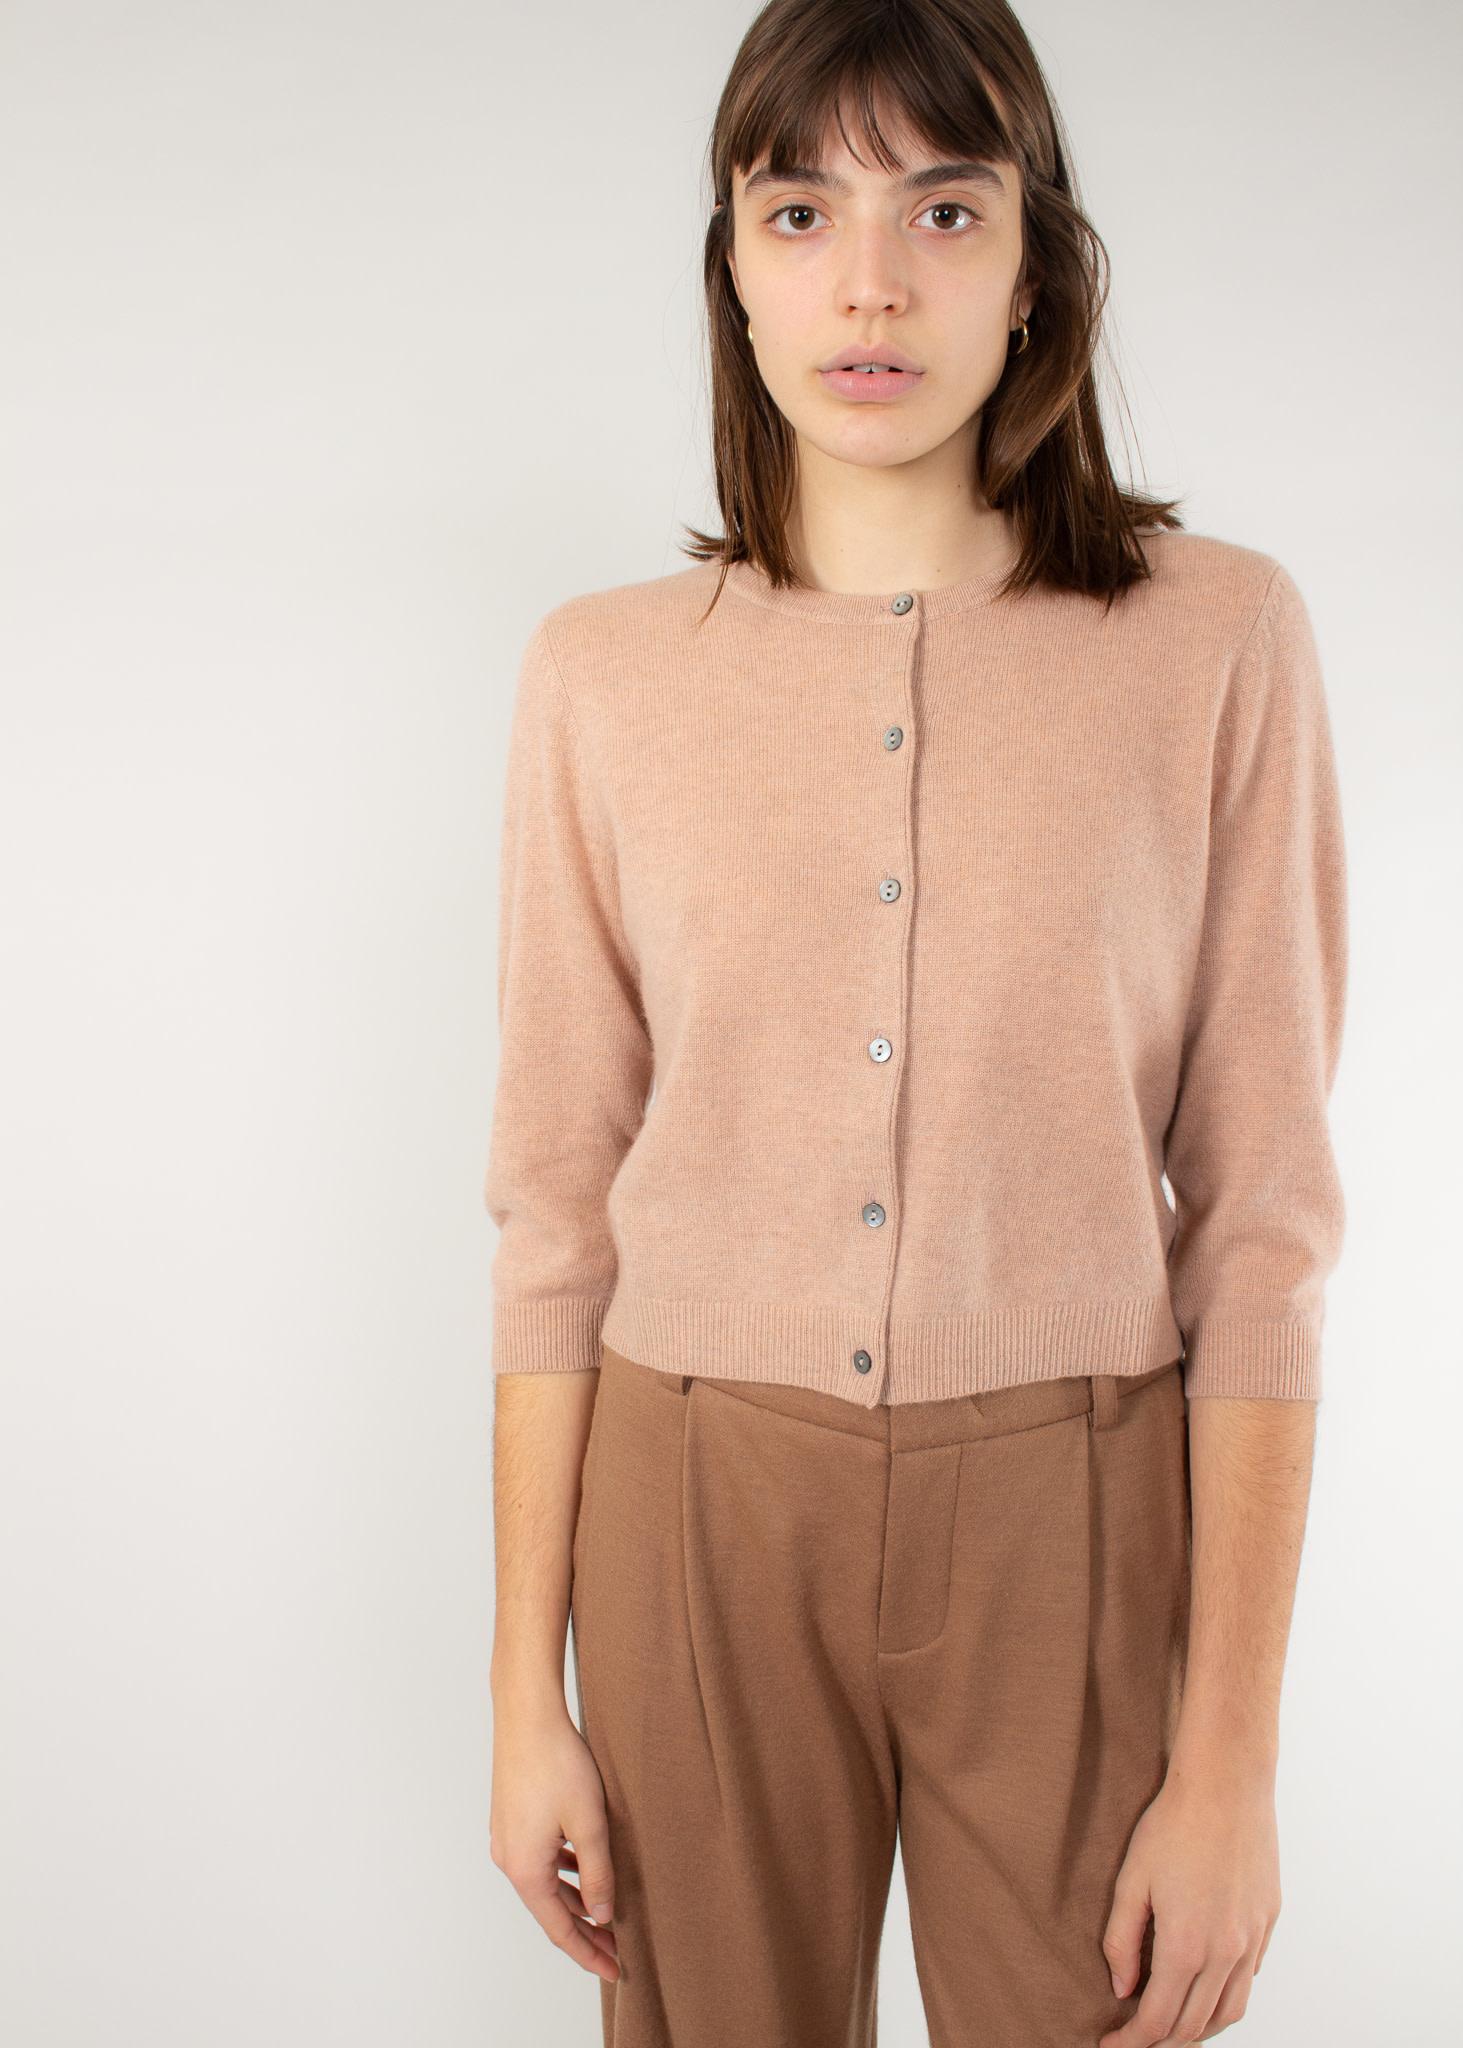 REPEAT Cashmere sweater skin